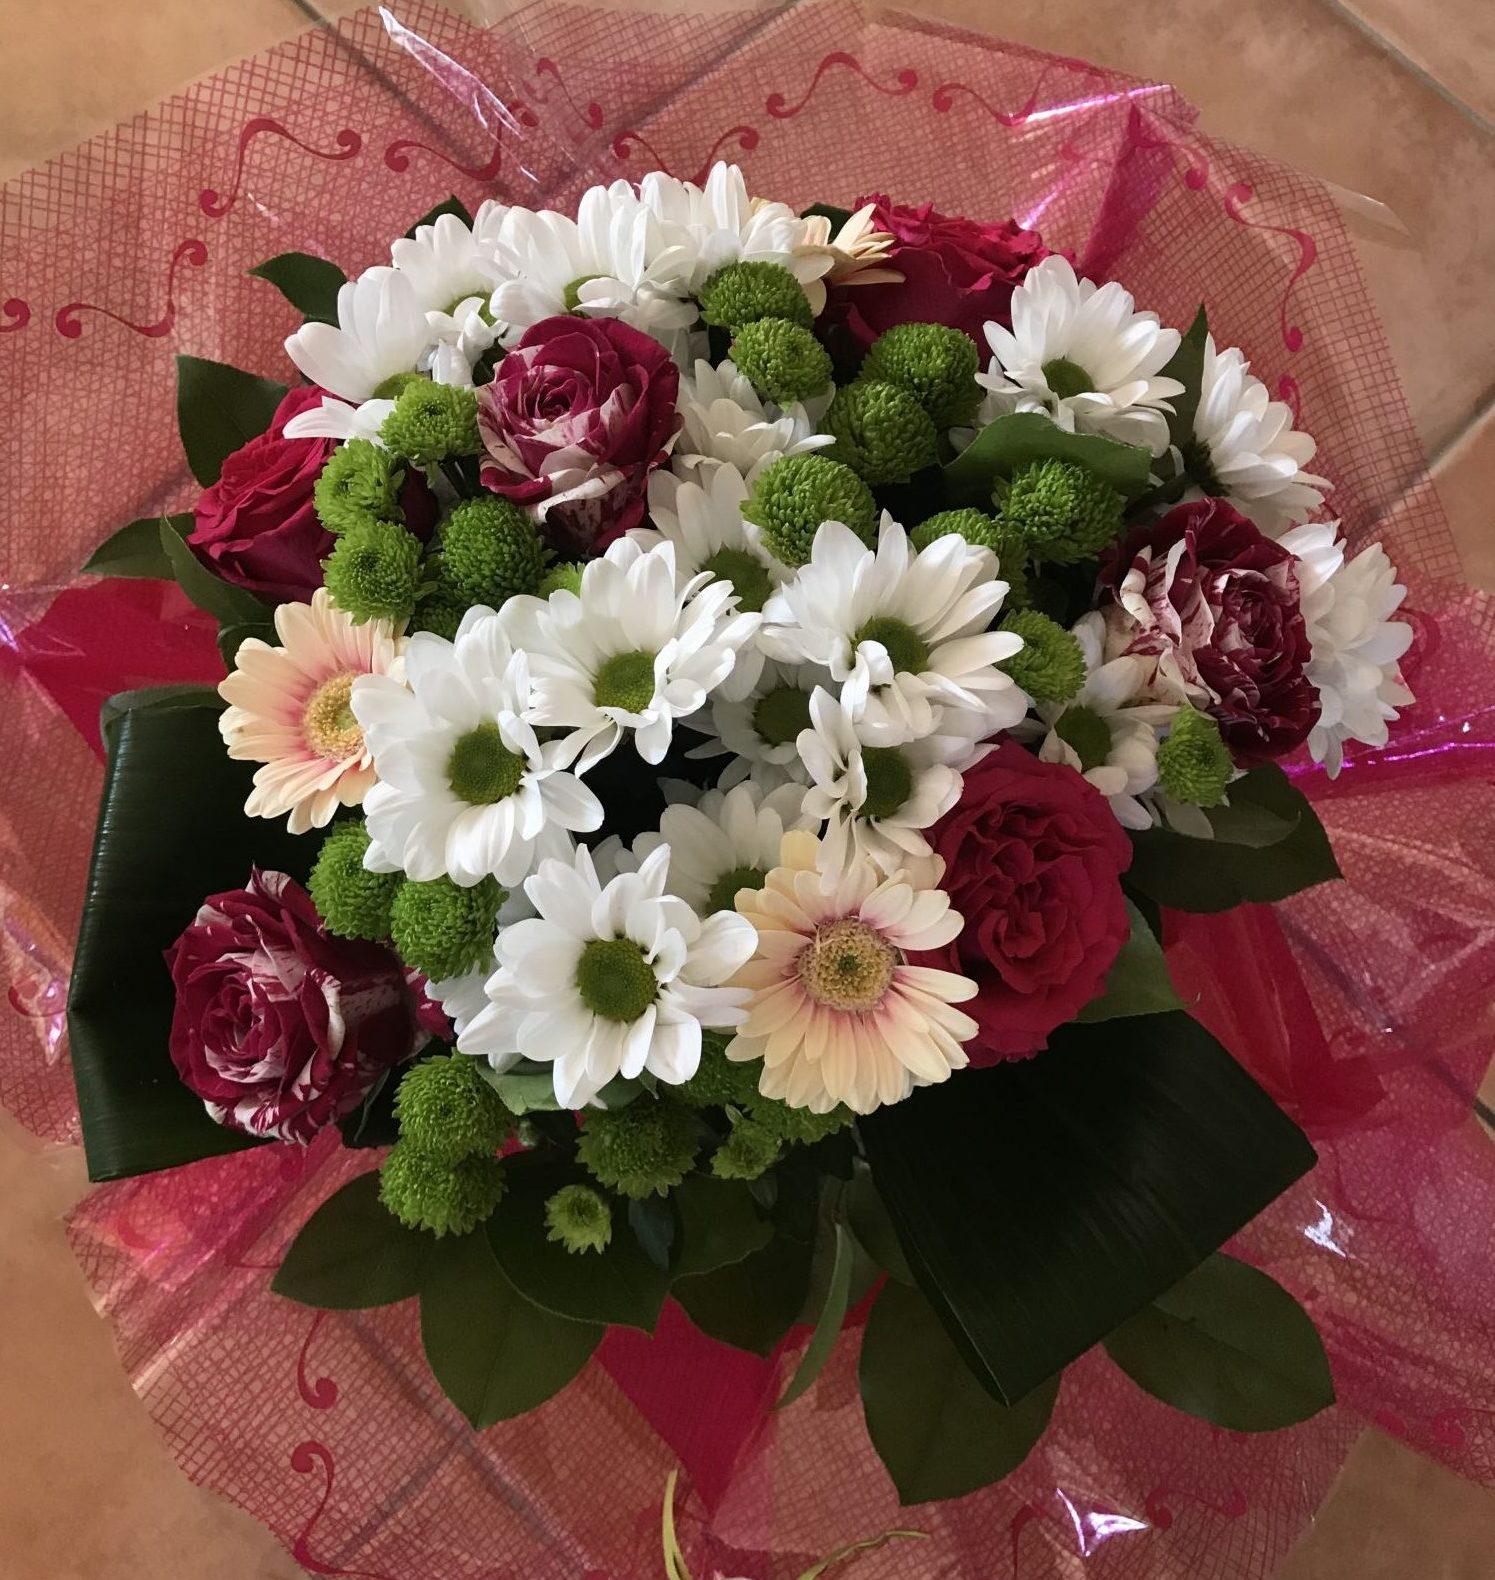 bouquet-rond-rouge-vert-blanc